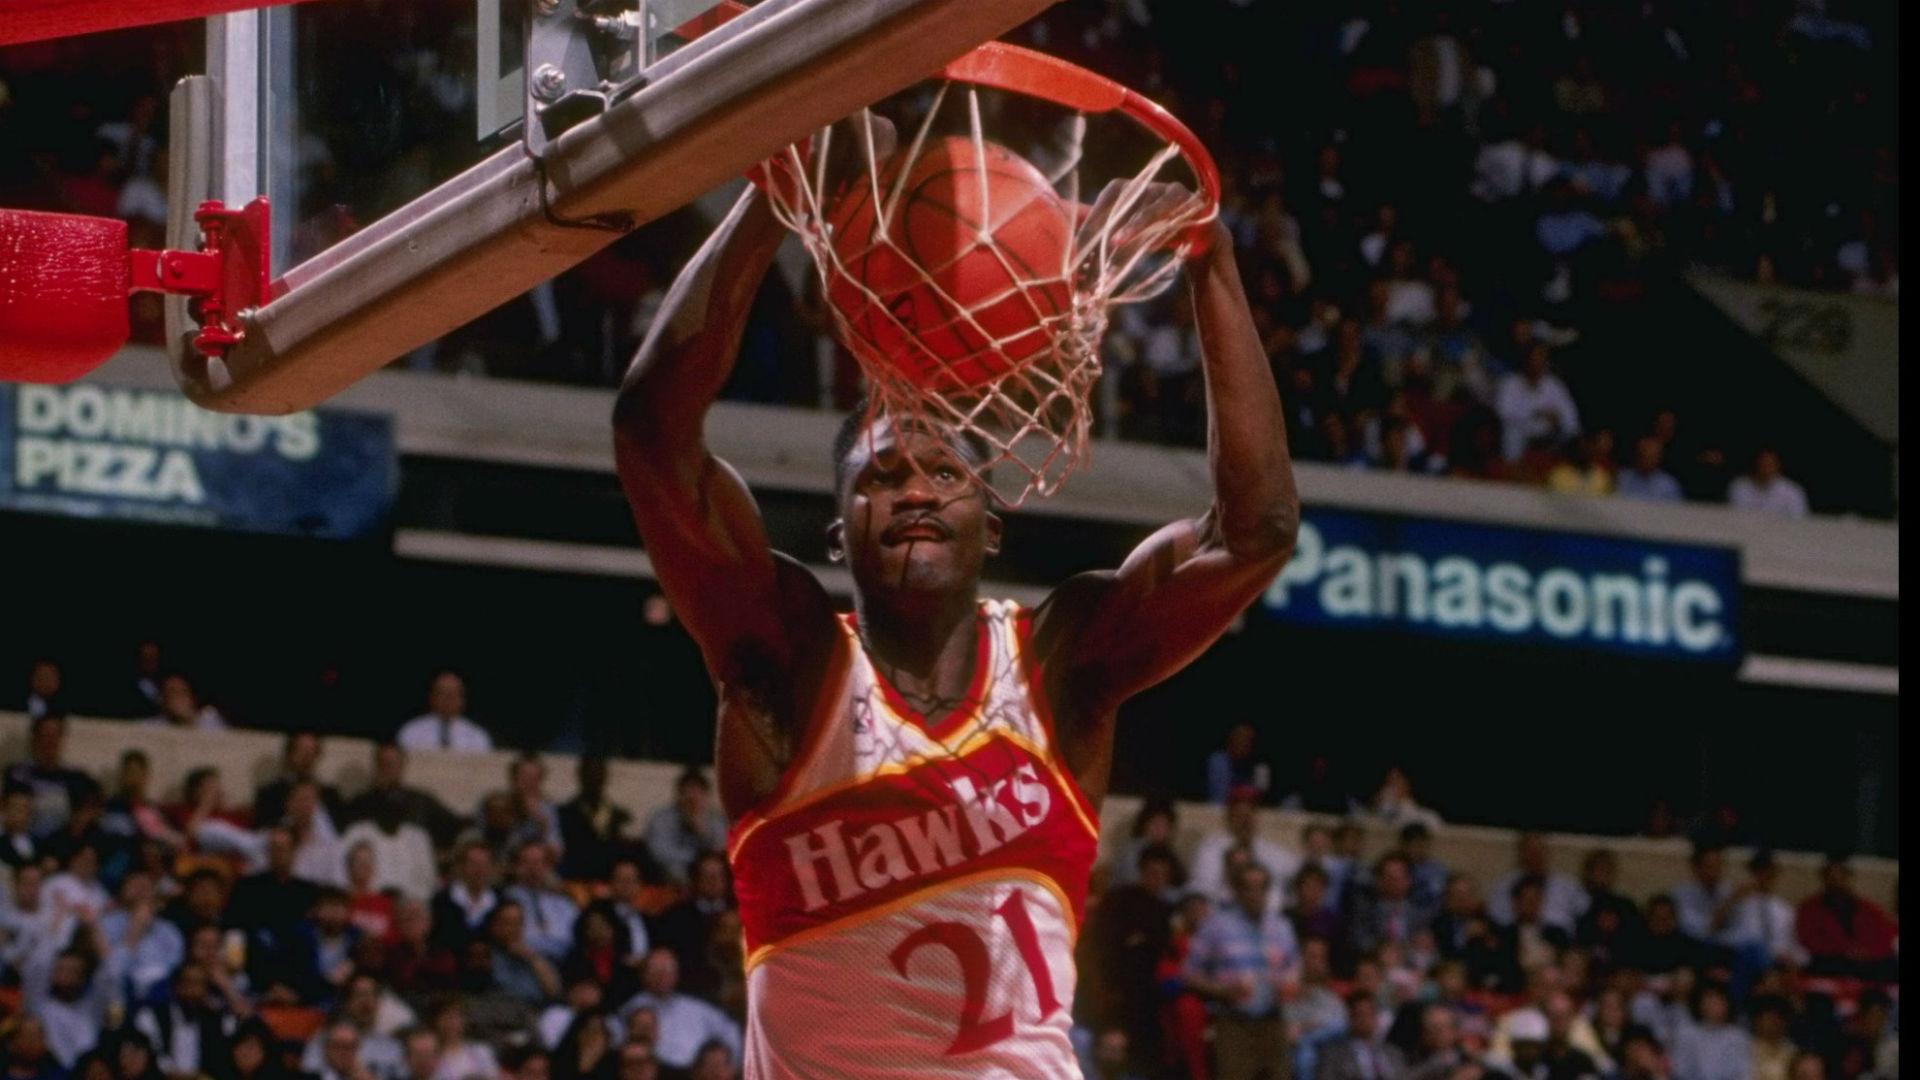 brand new 8828b 903d0 Dominique Wilkins still thinks he beat Michael Jordan in 1988 Slam Dunk  Contest   Sporting News